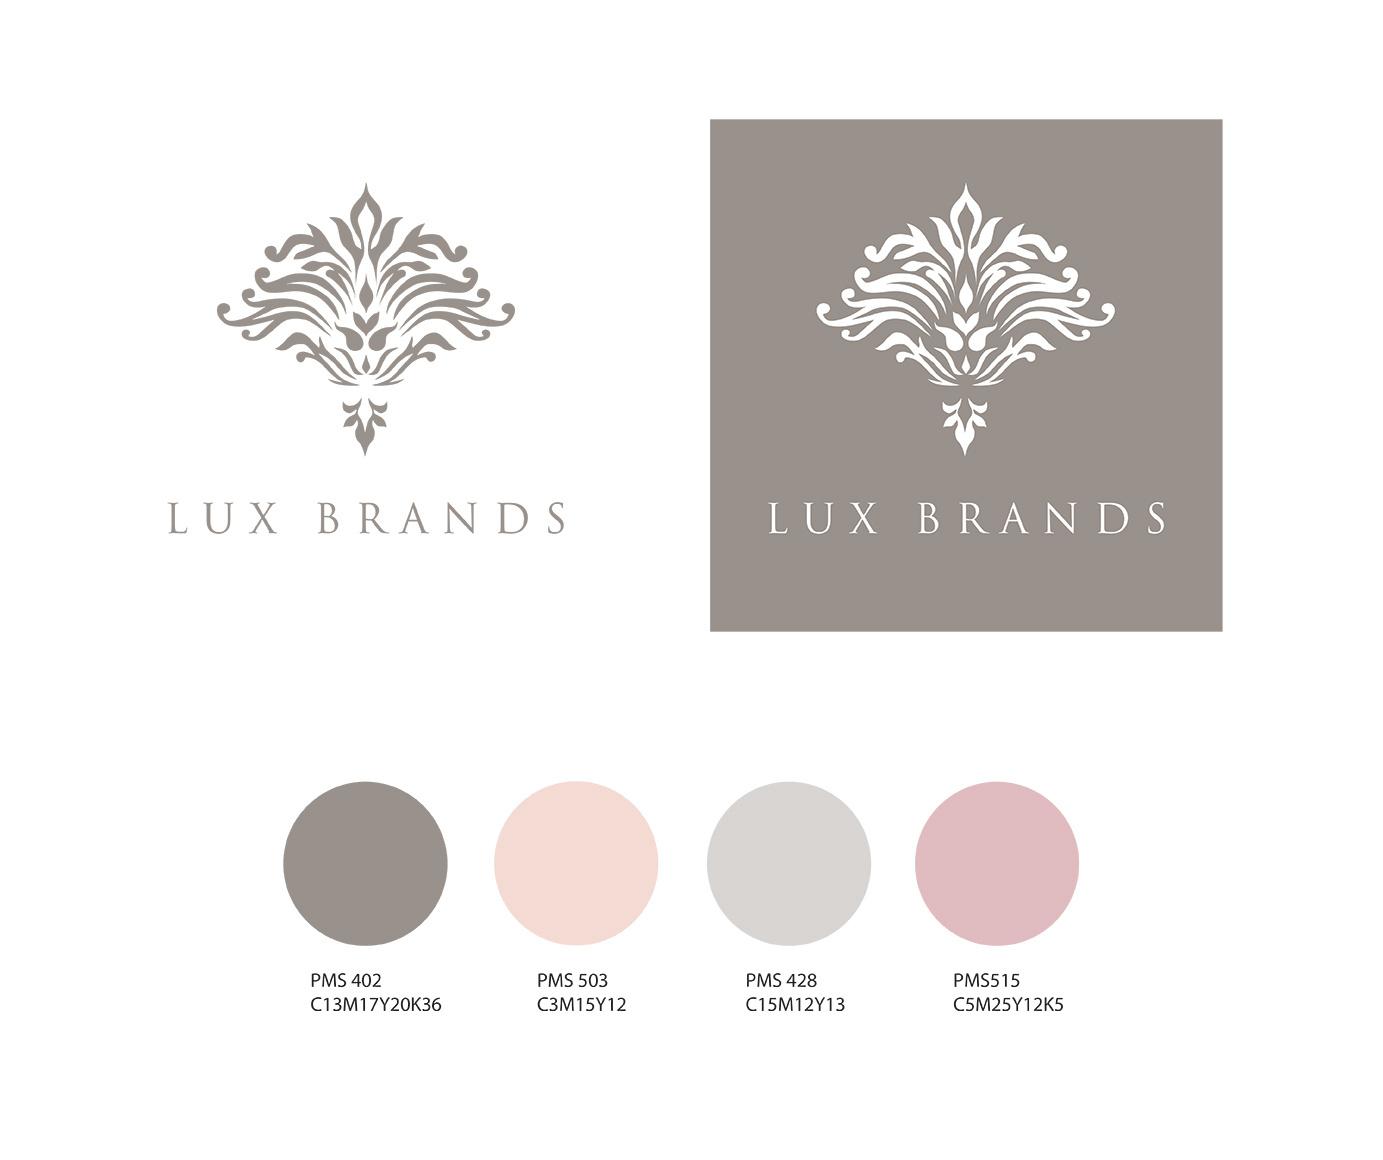 Lux Brands